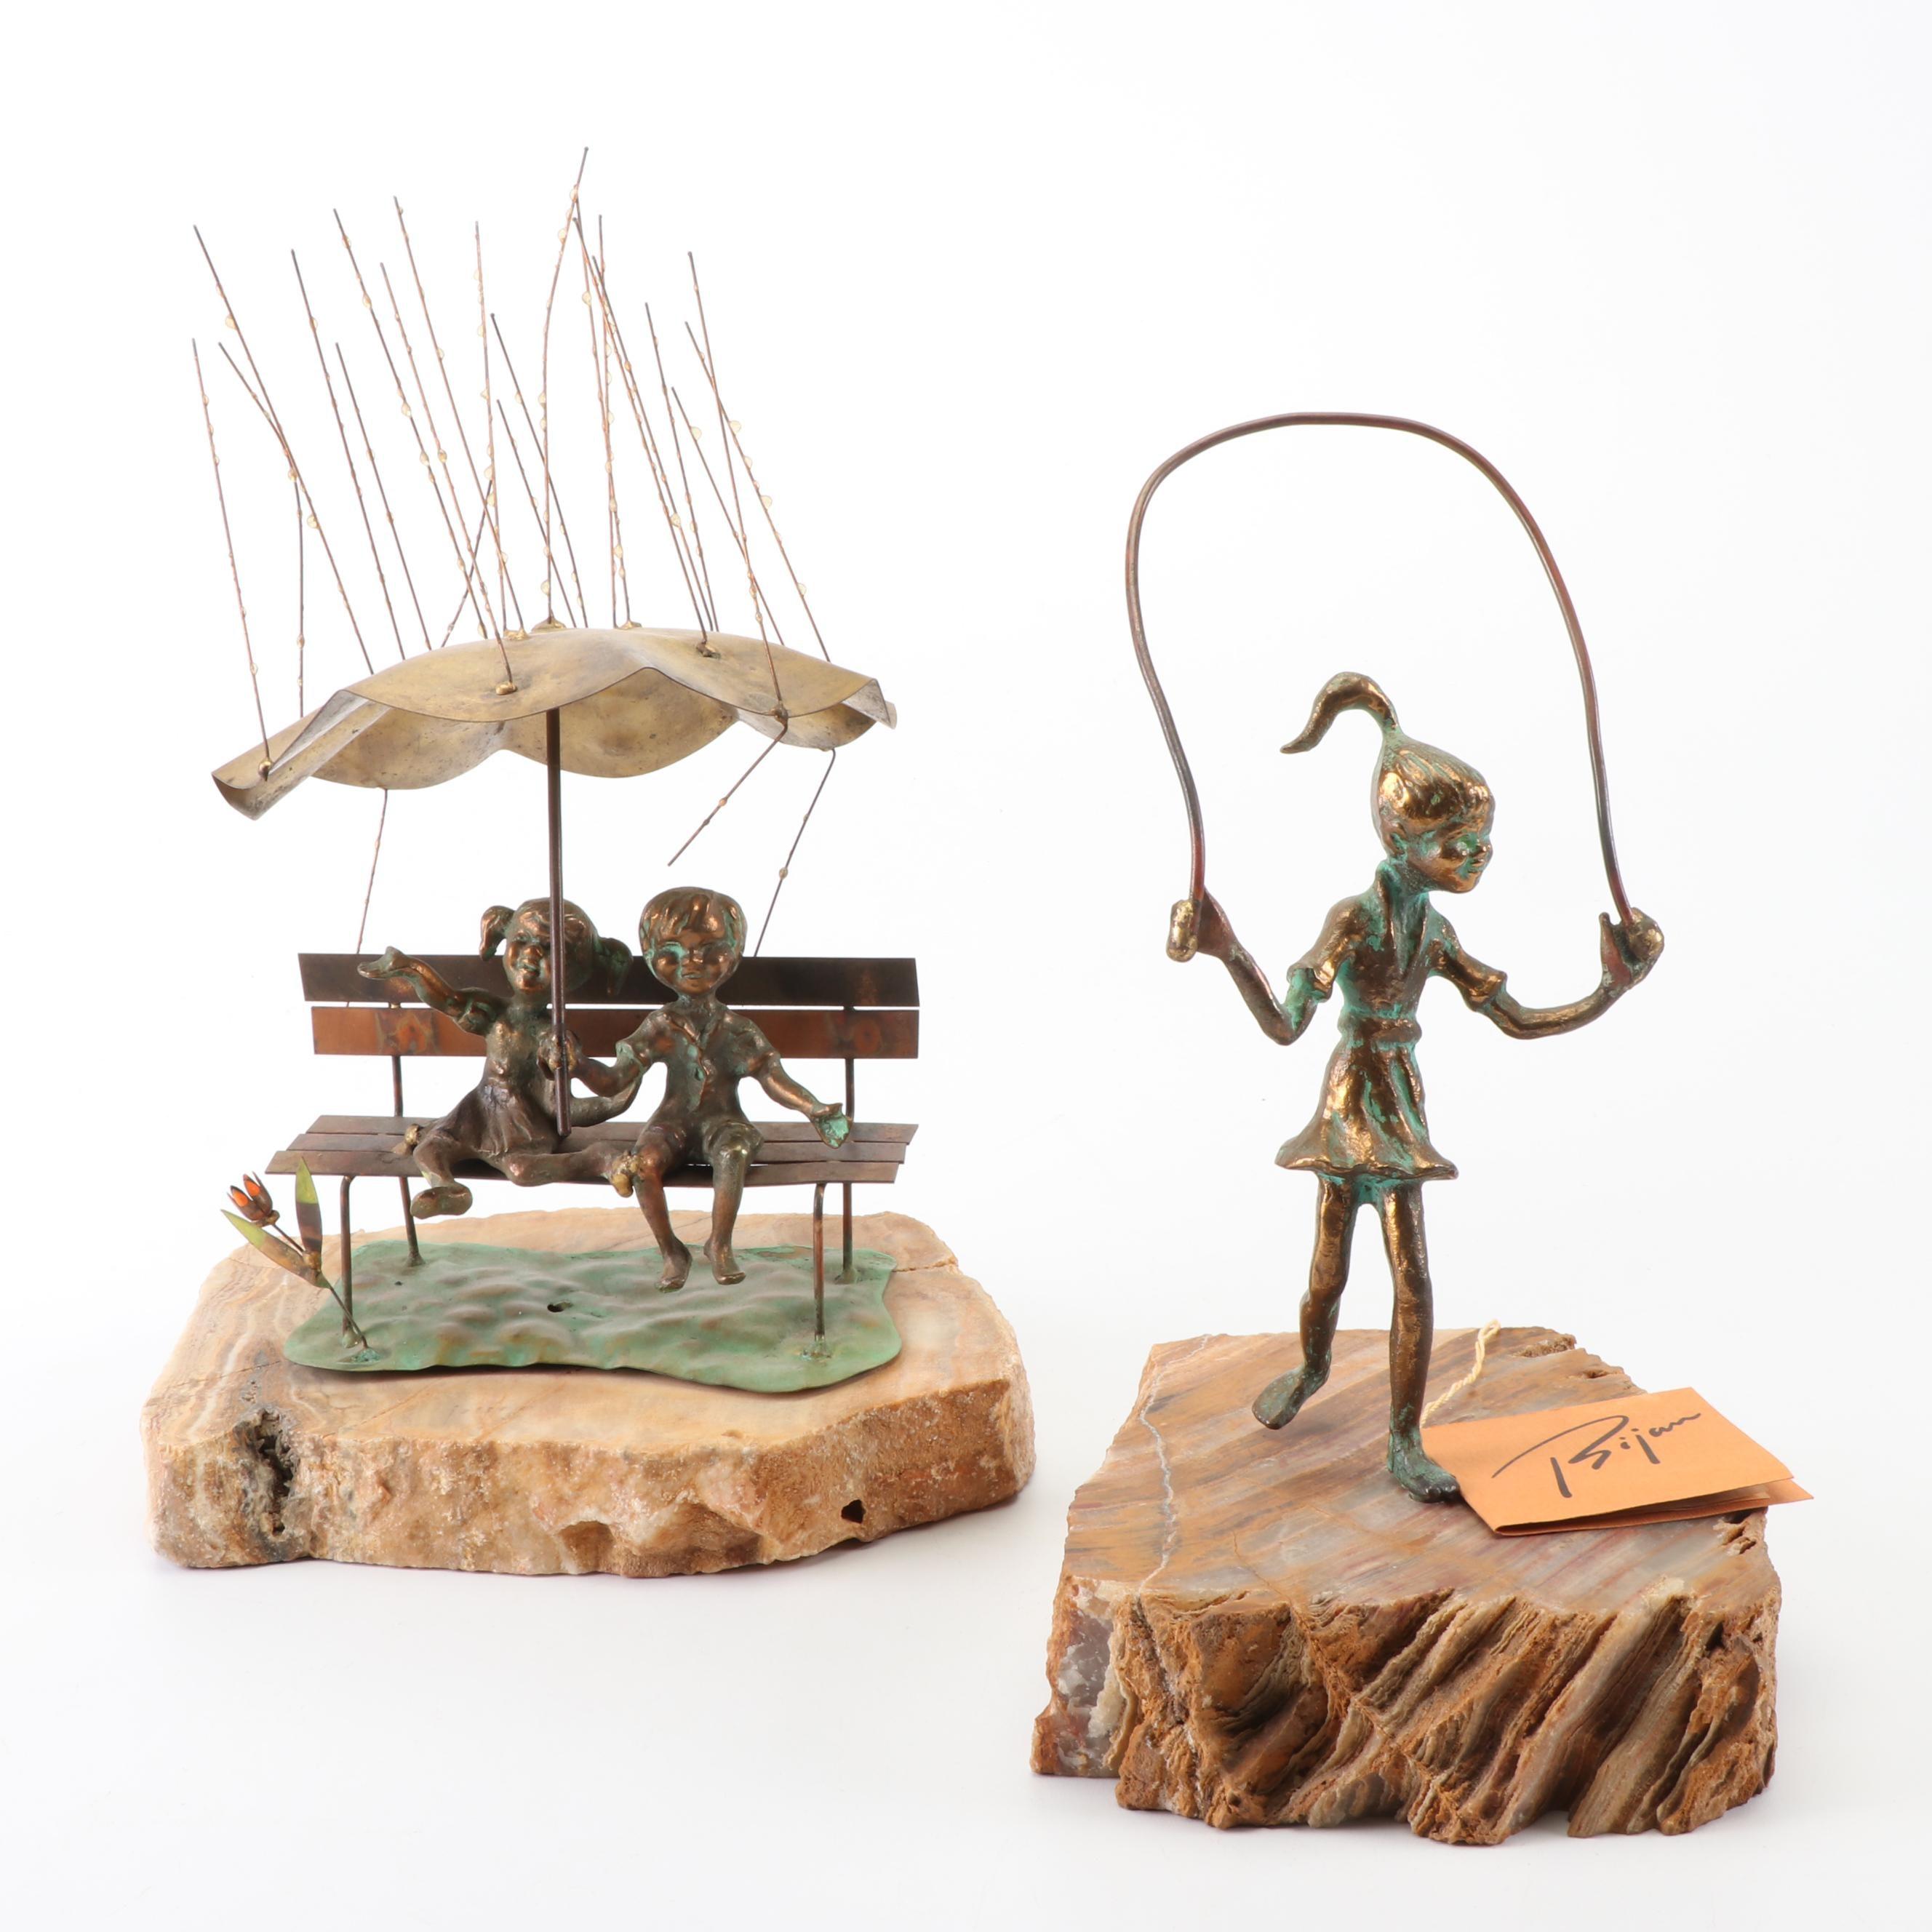 Bijan J. Bijan Brass and Copper Alloy Sculptures